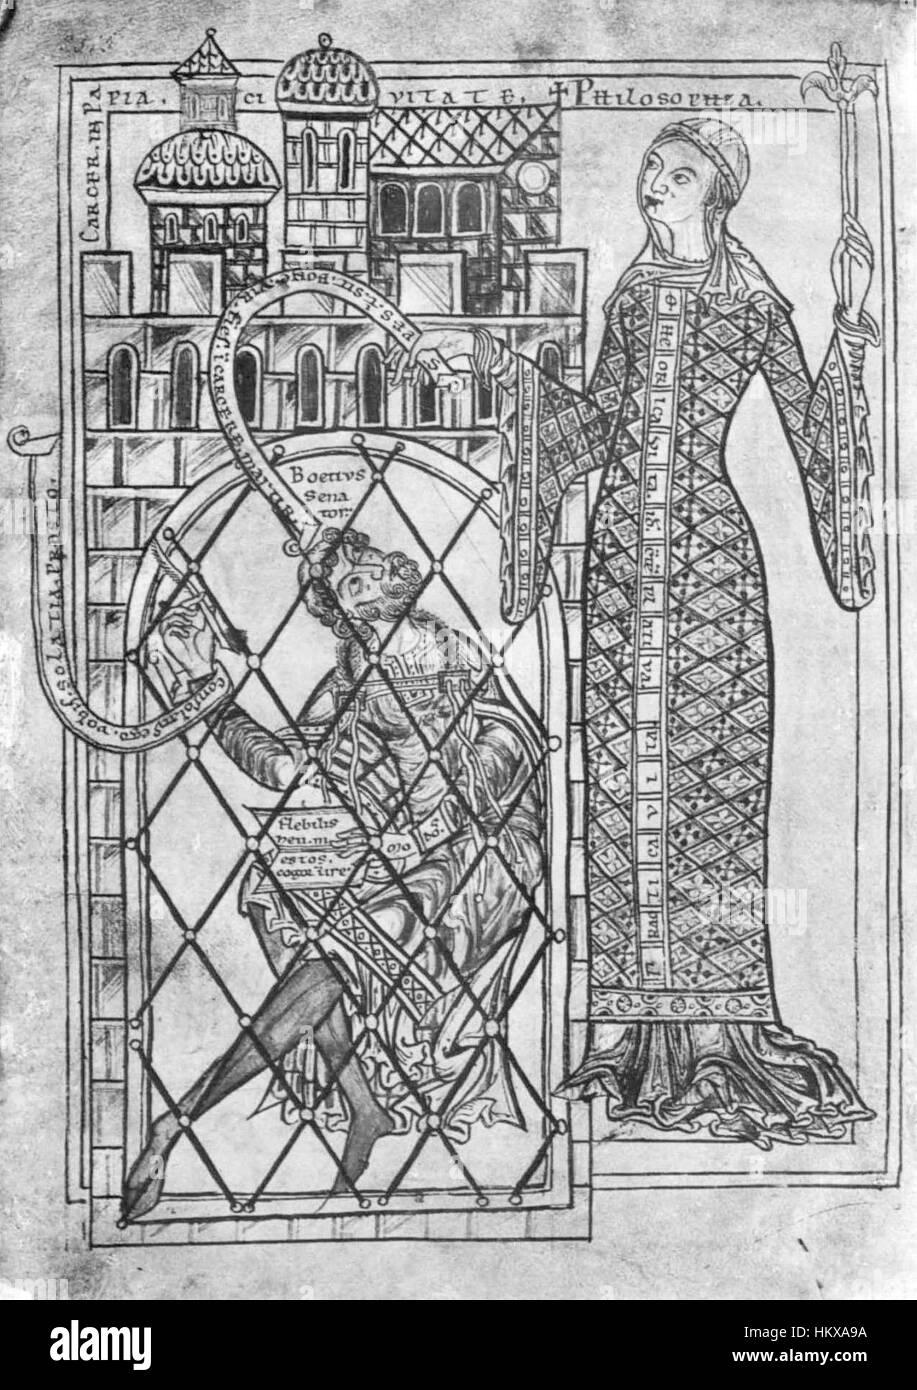 Boethius-philosophia-bsb-cod-lat-2599-f106v-c1200